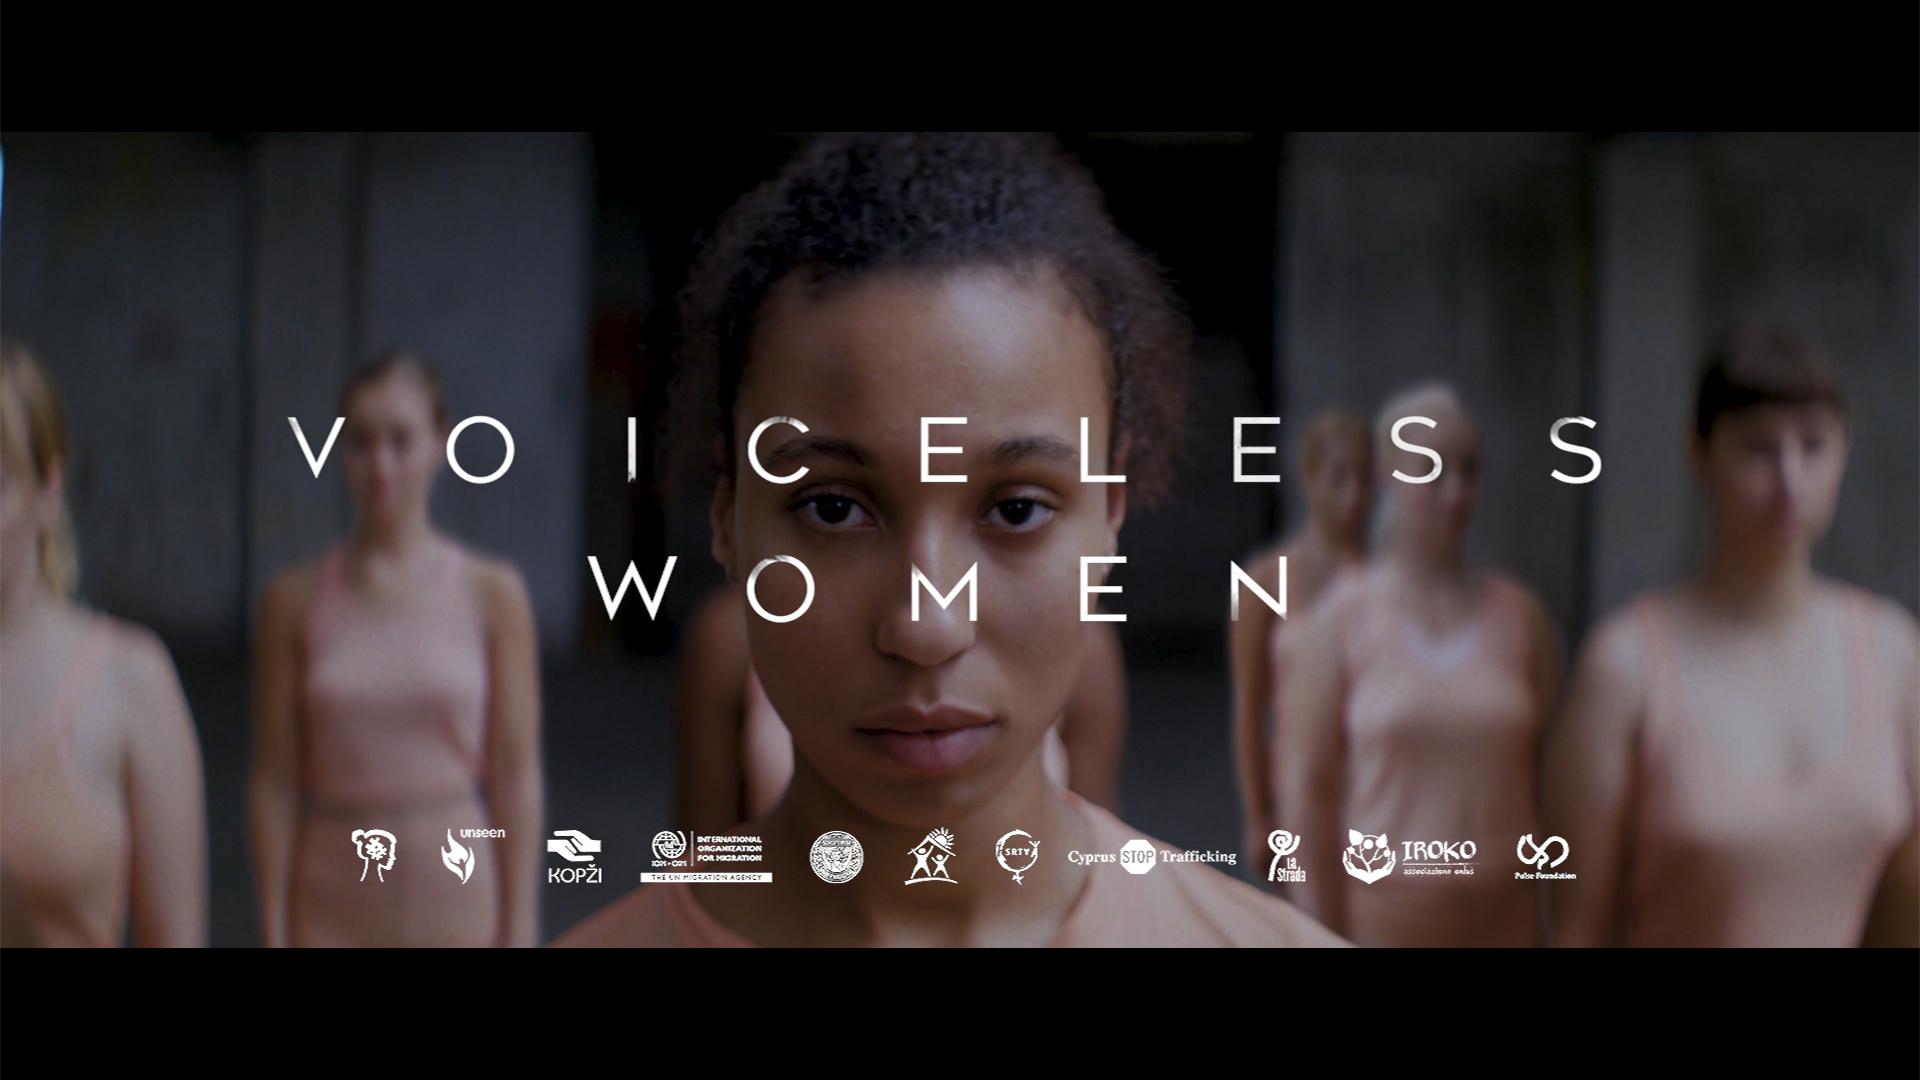 The Voiceless Women Thumbnail